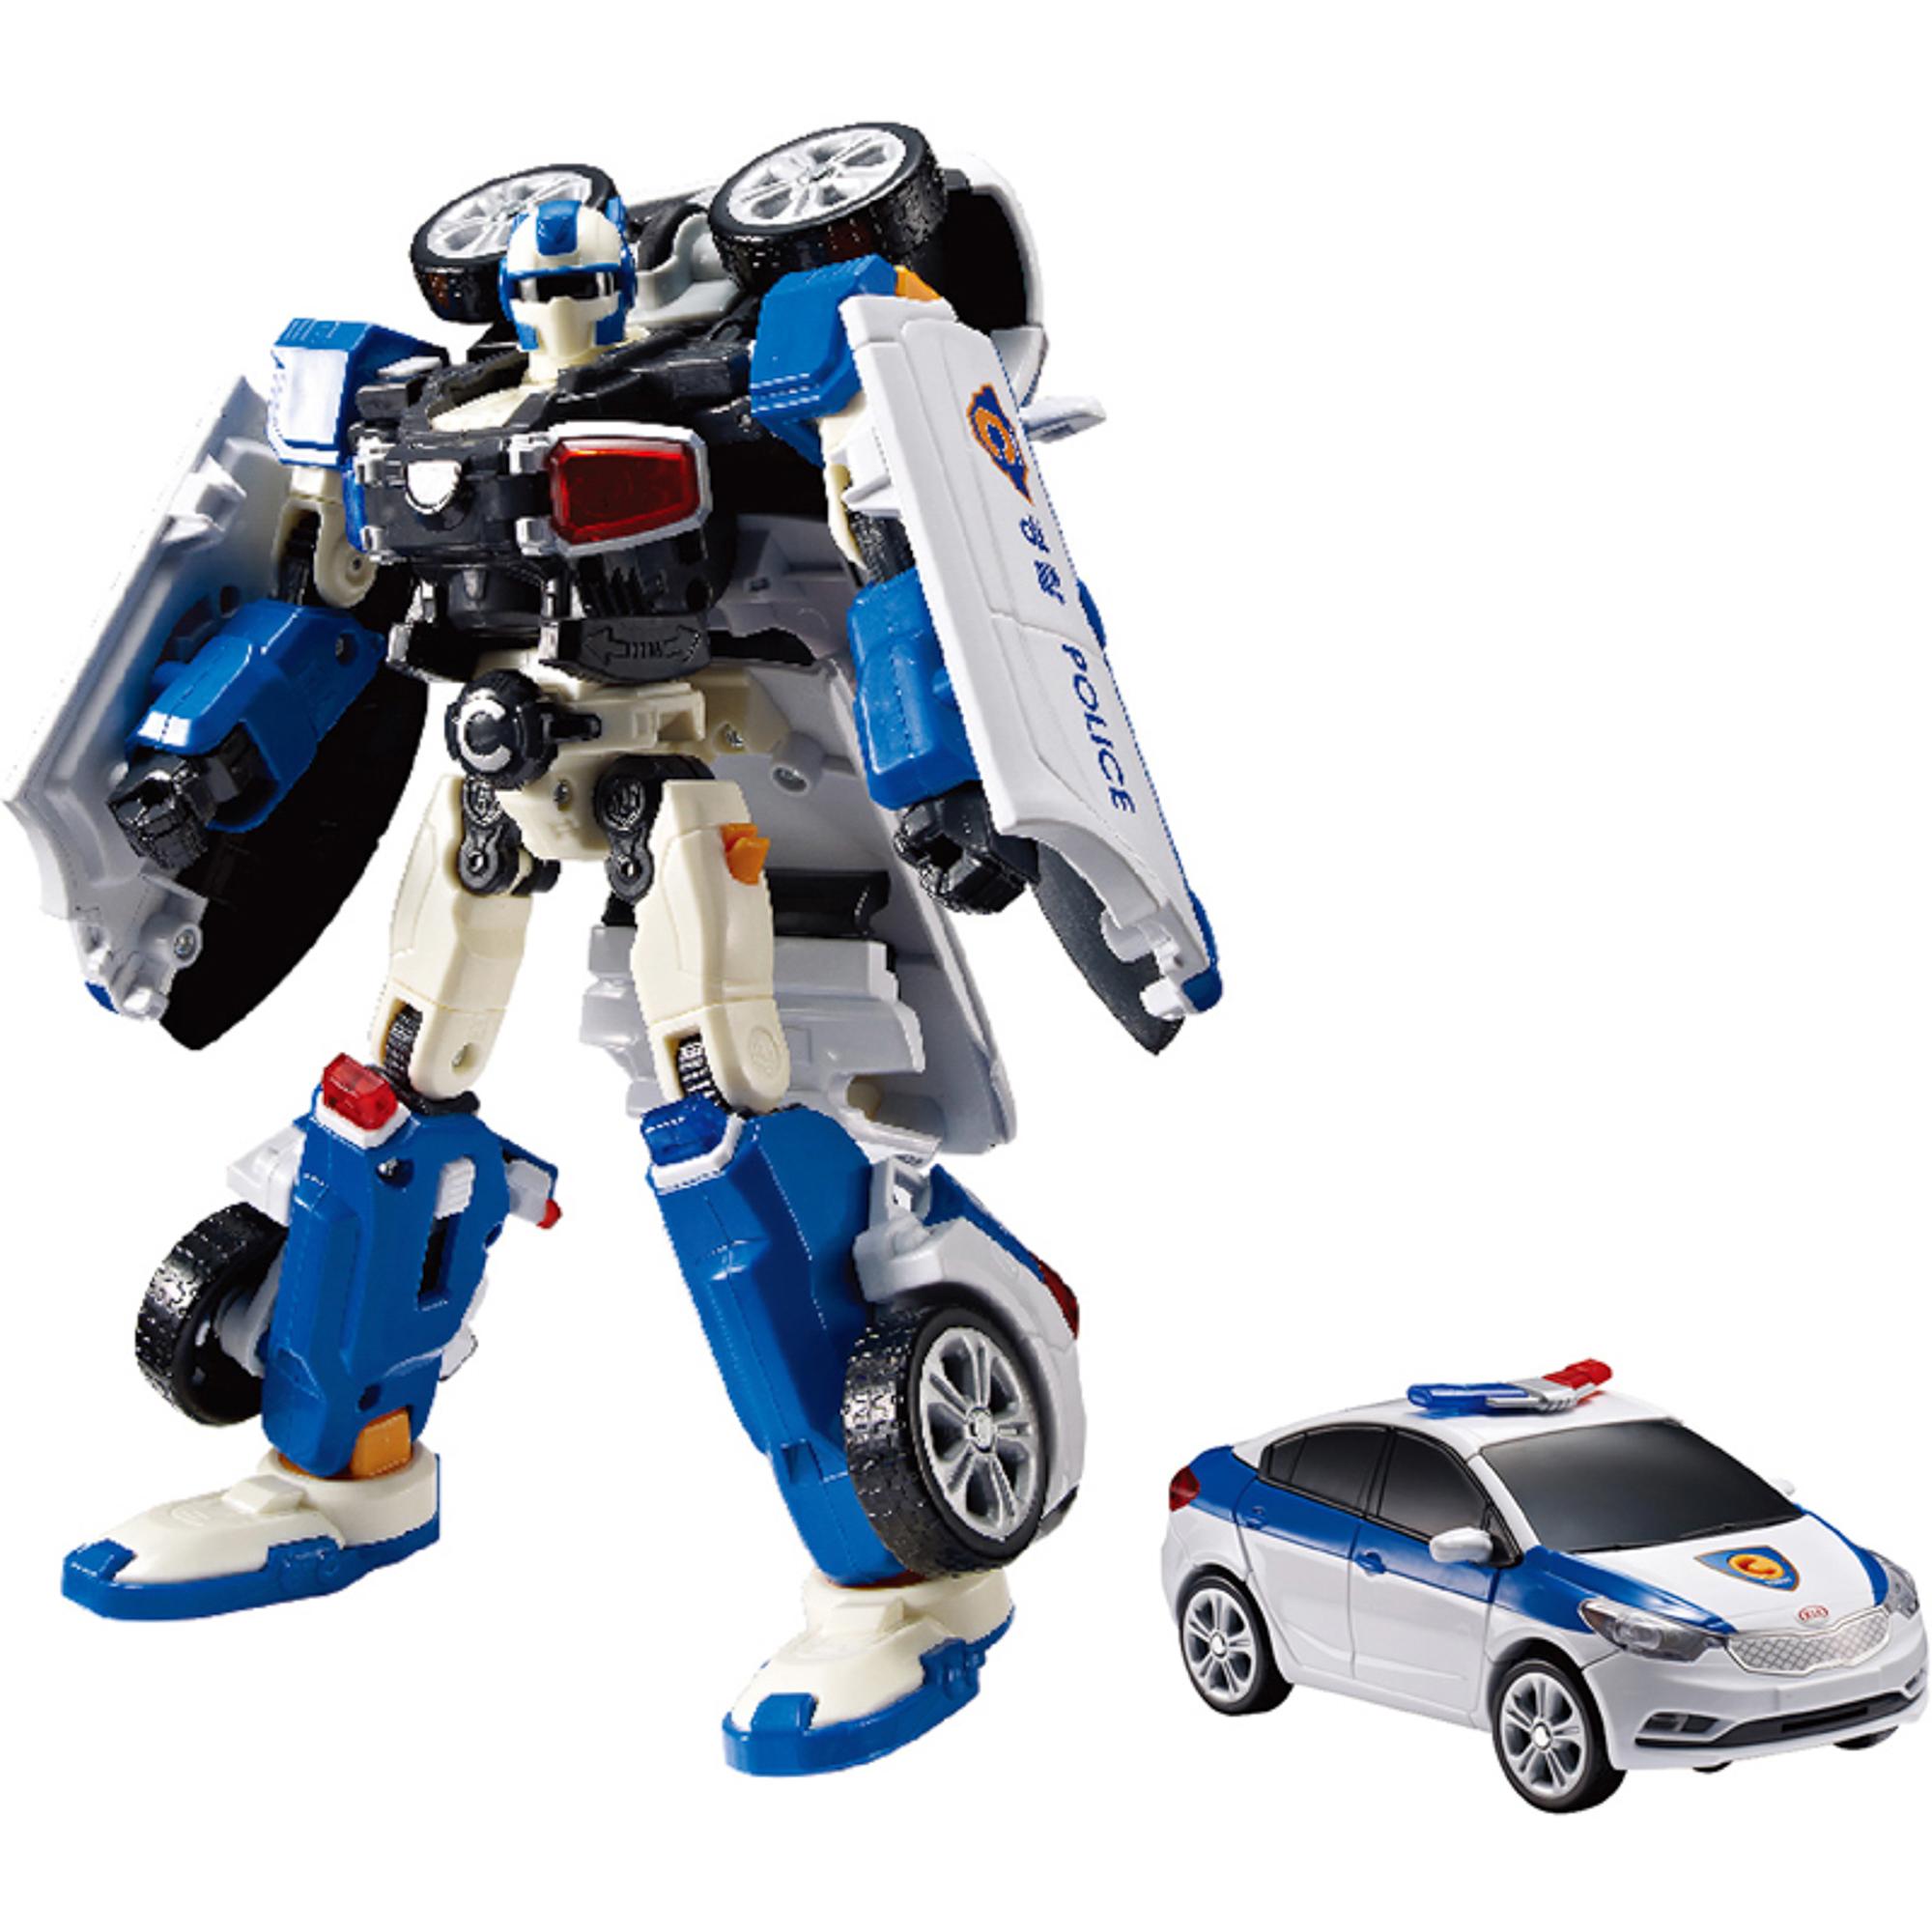 Робот-трансформер Tobot C Rescue фото